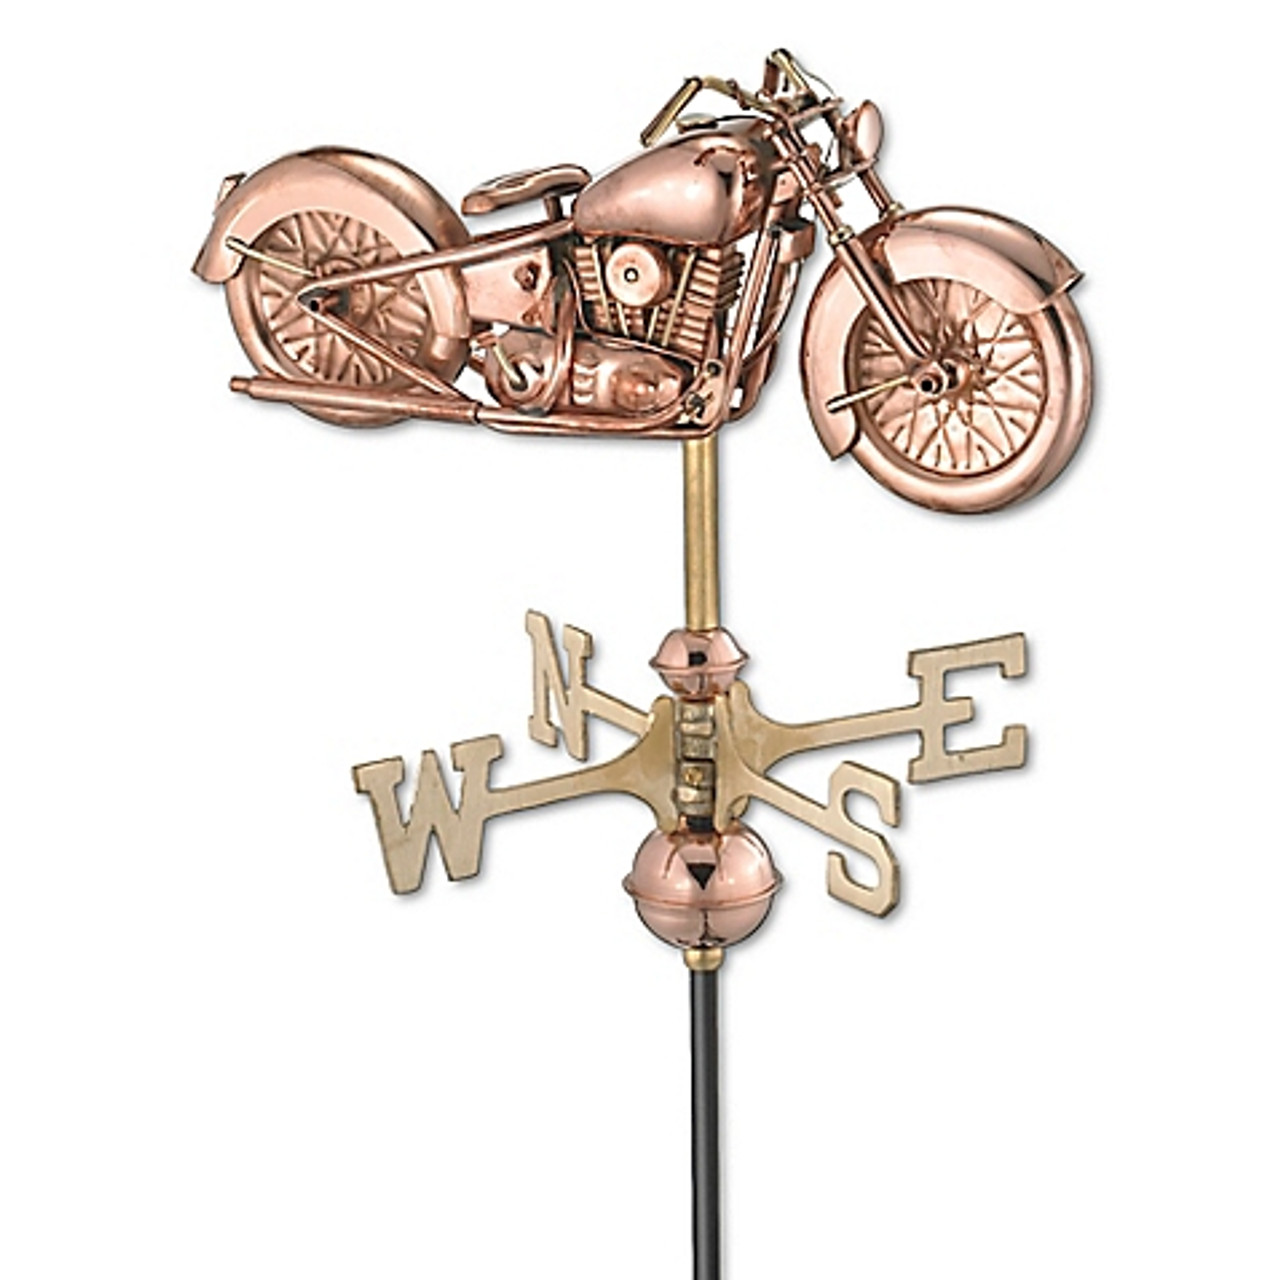 Weathervane - Motorcycle Garden Size - Polished Copper